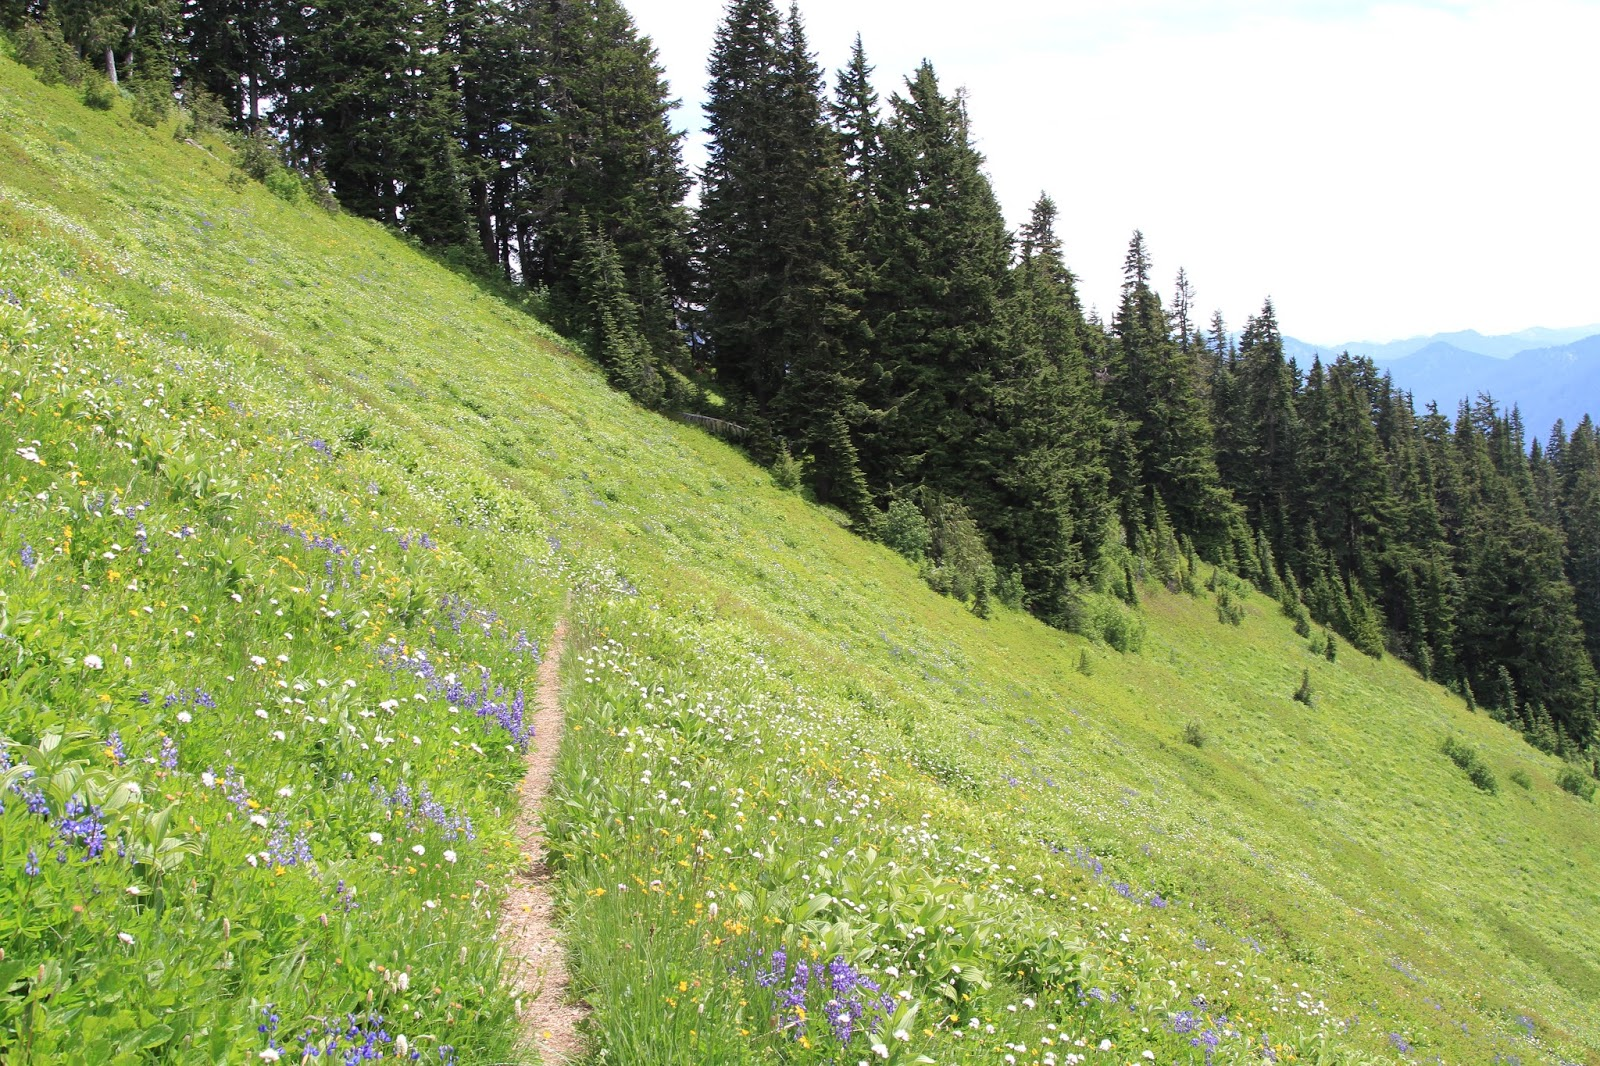 Ridge Hike Seattle Ridge Hike Route Trail